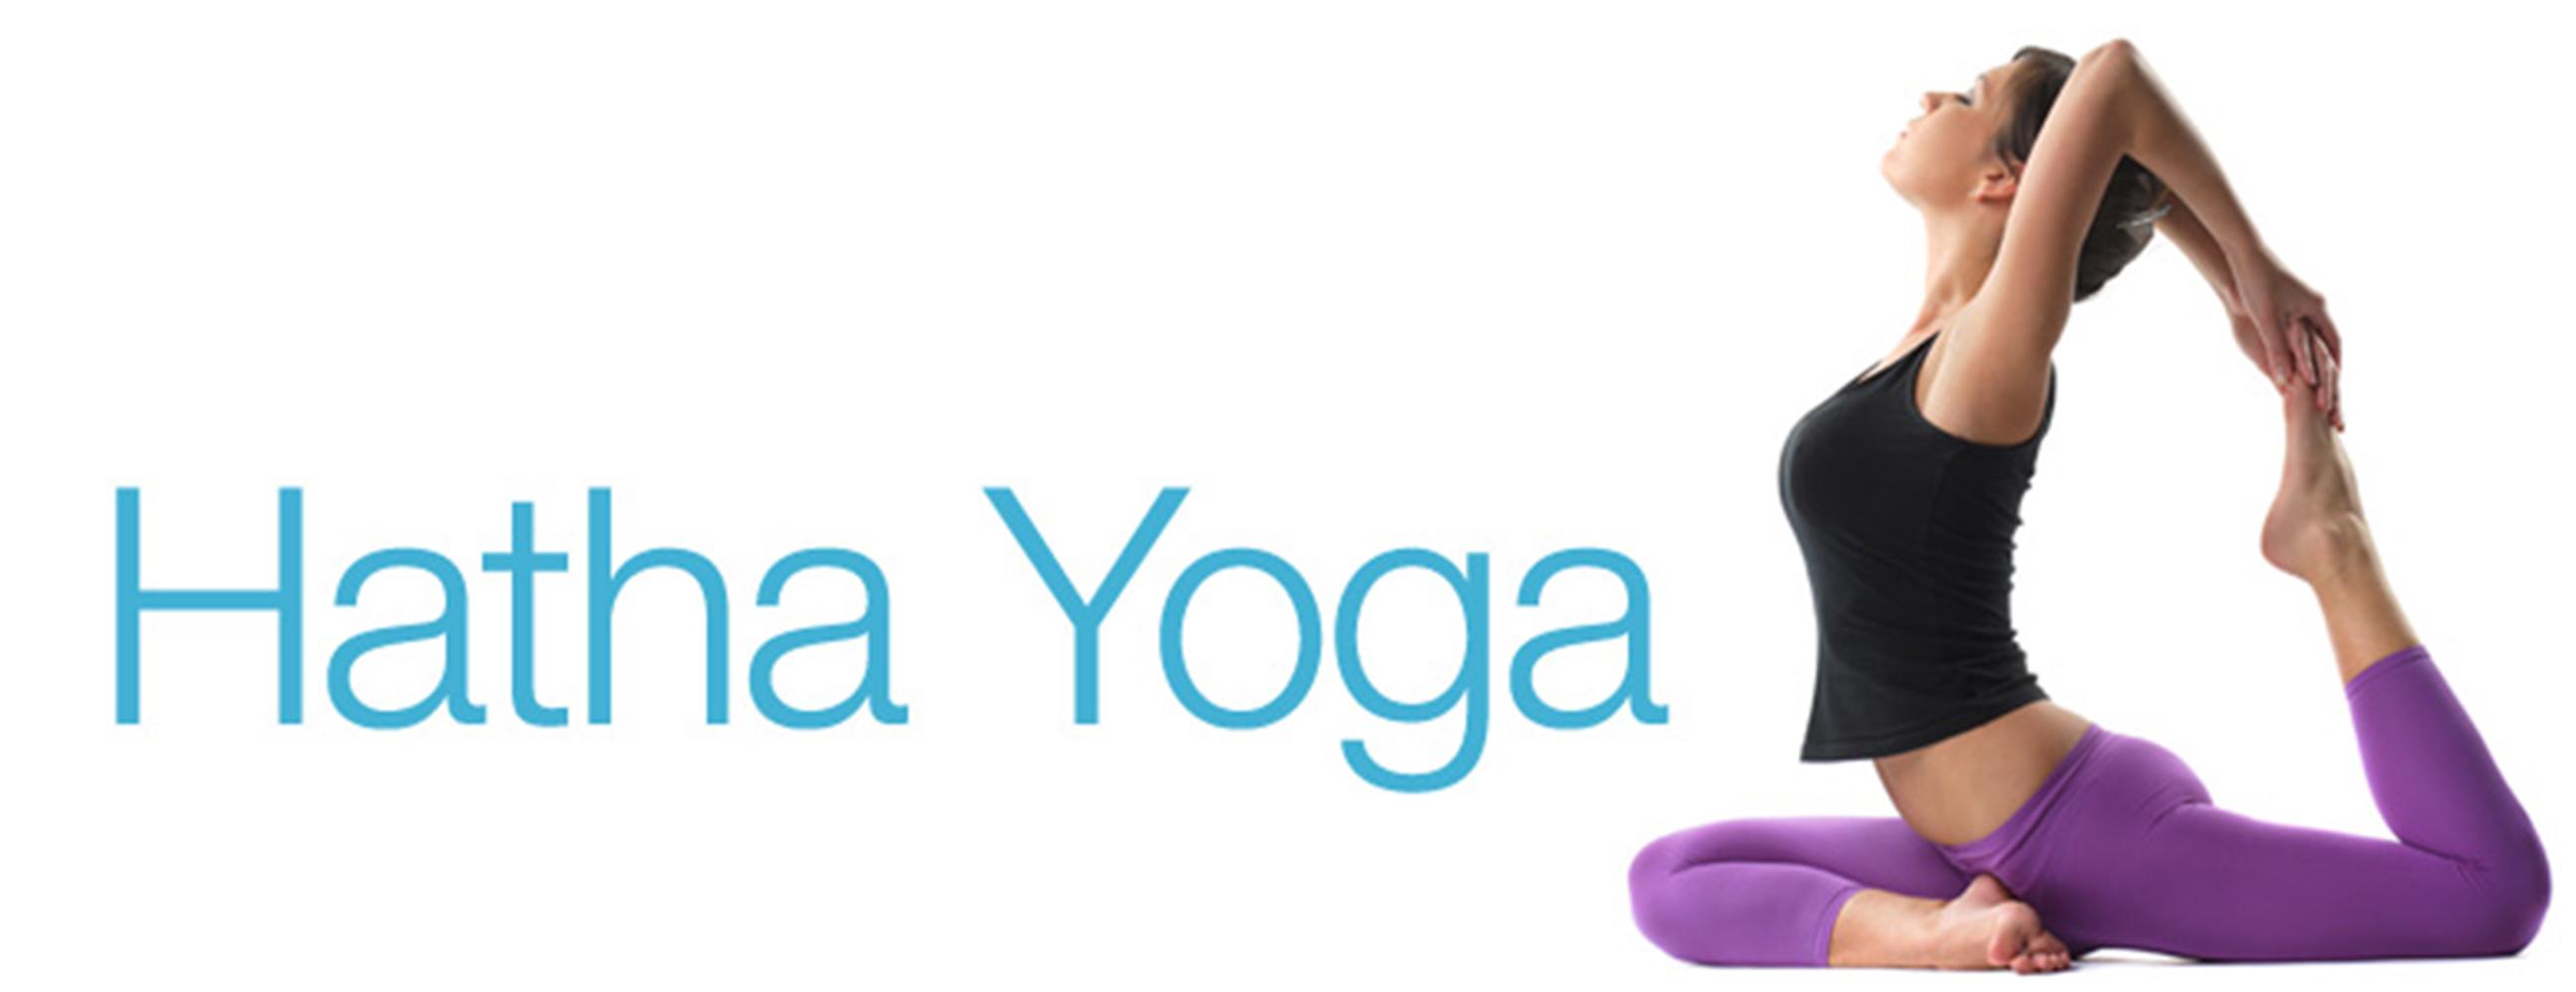 hatha yoga1